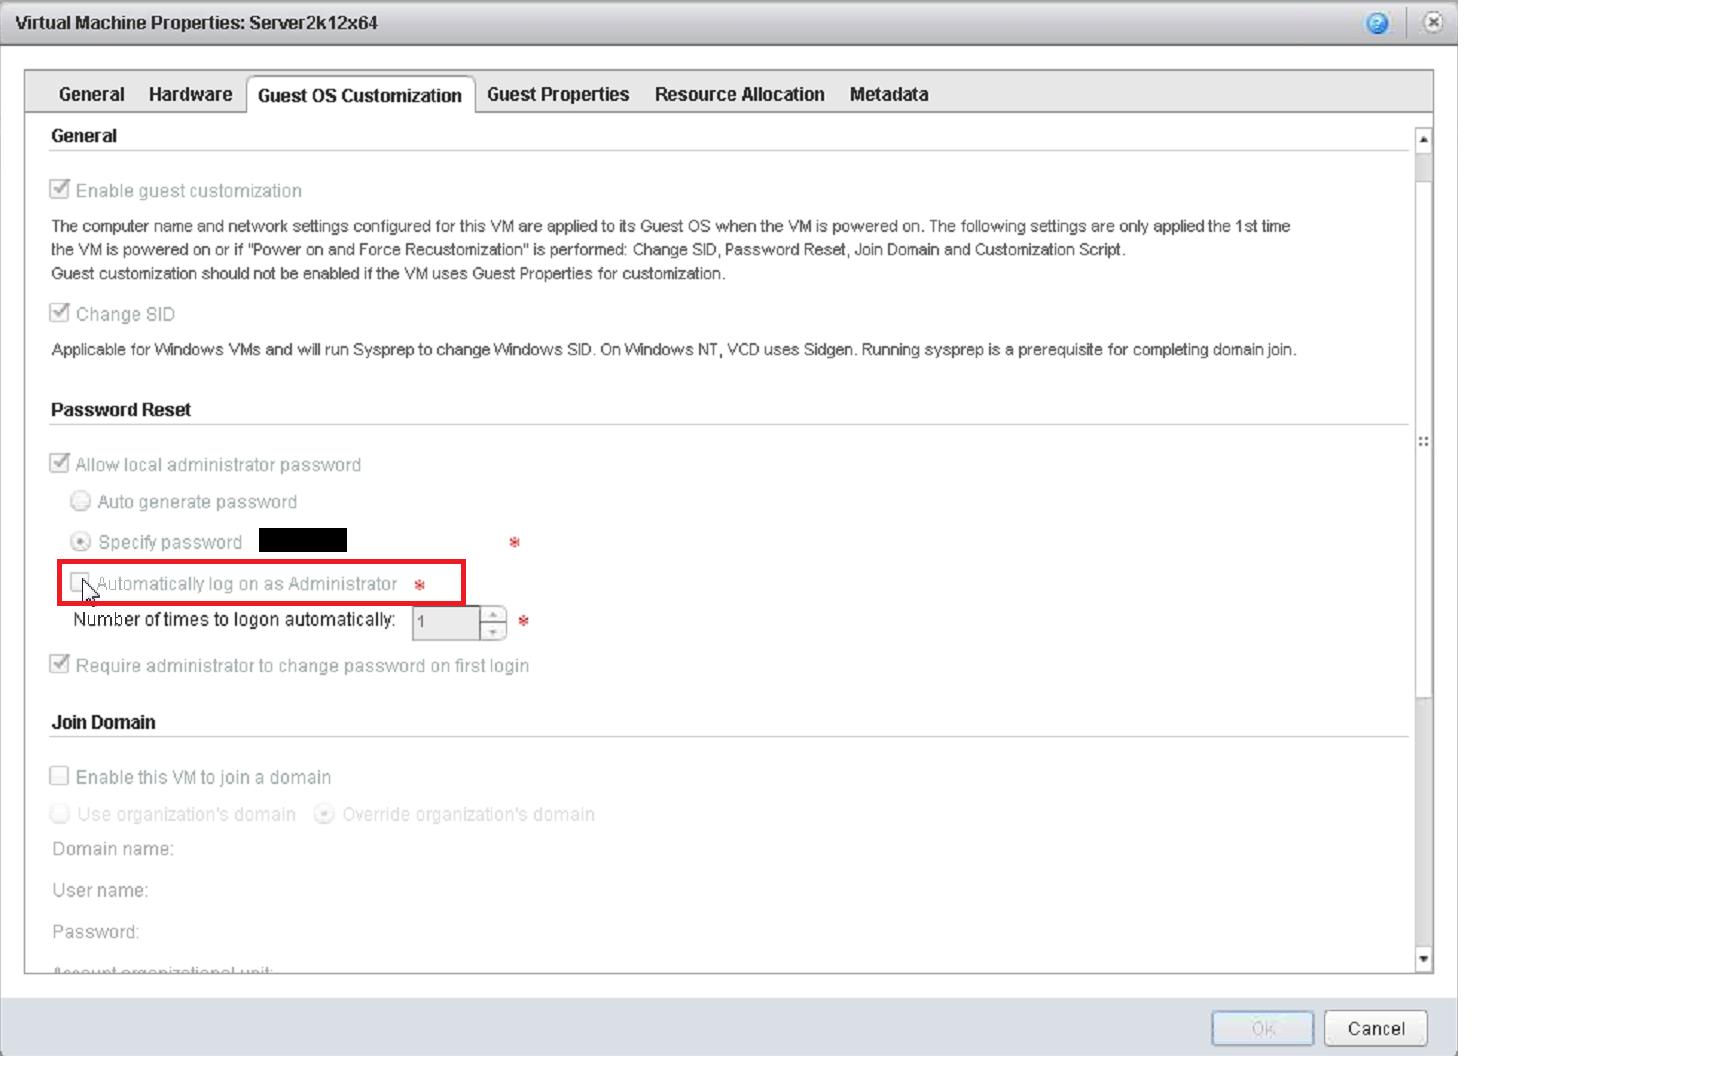 vRA deployment to vcloud Air fails Automatically login as an administrator